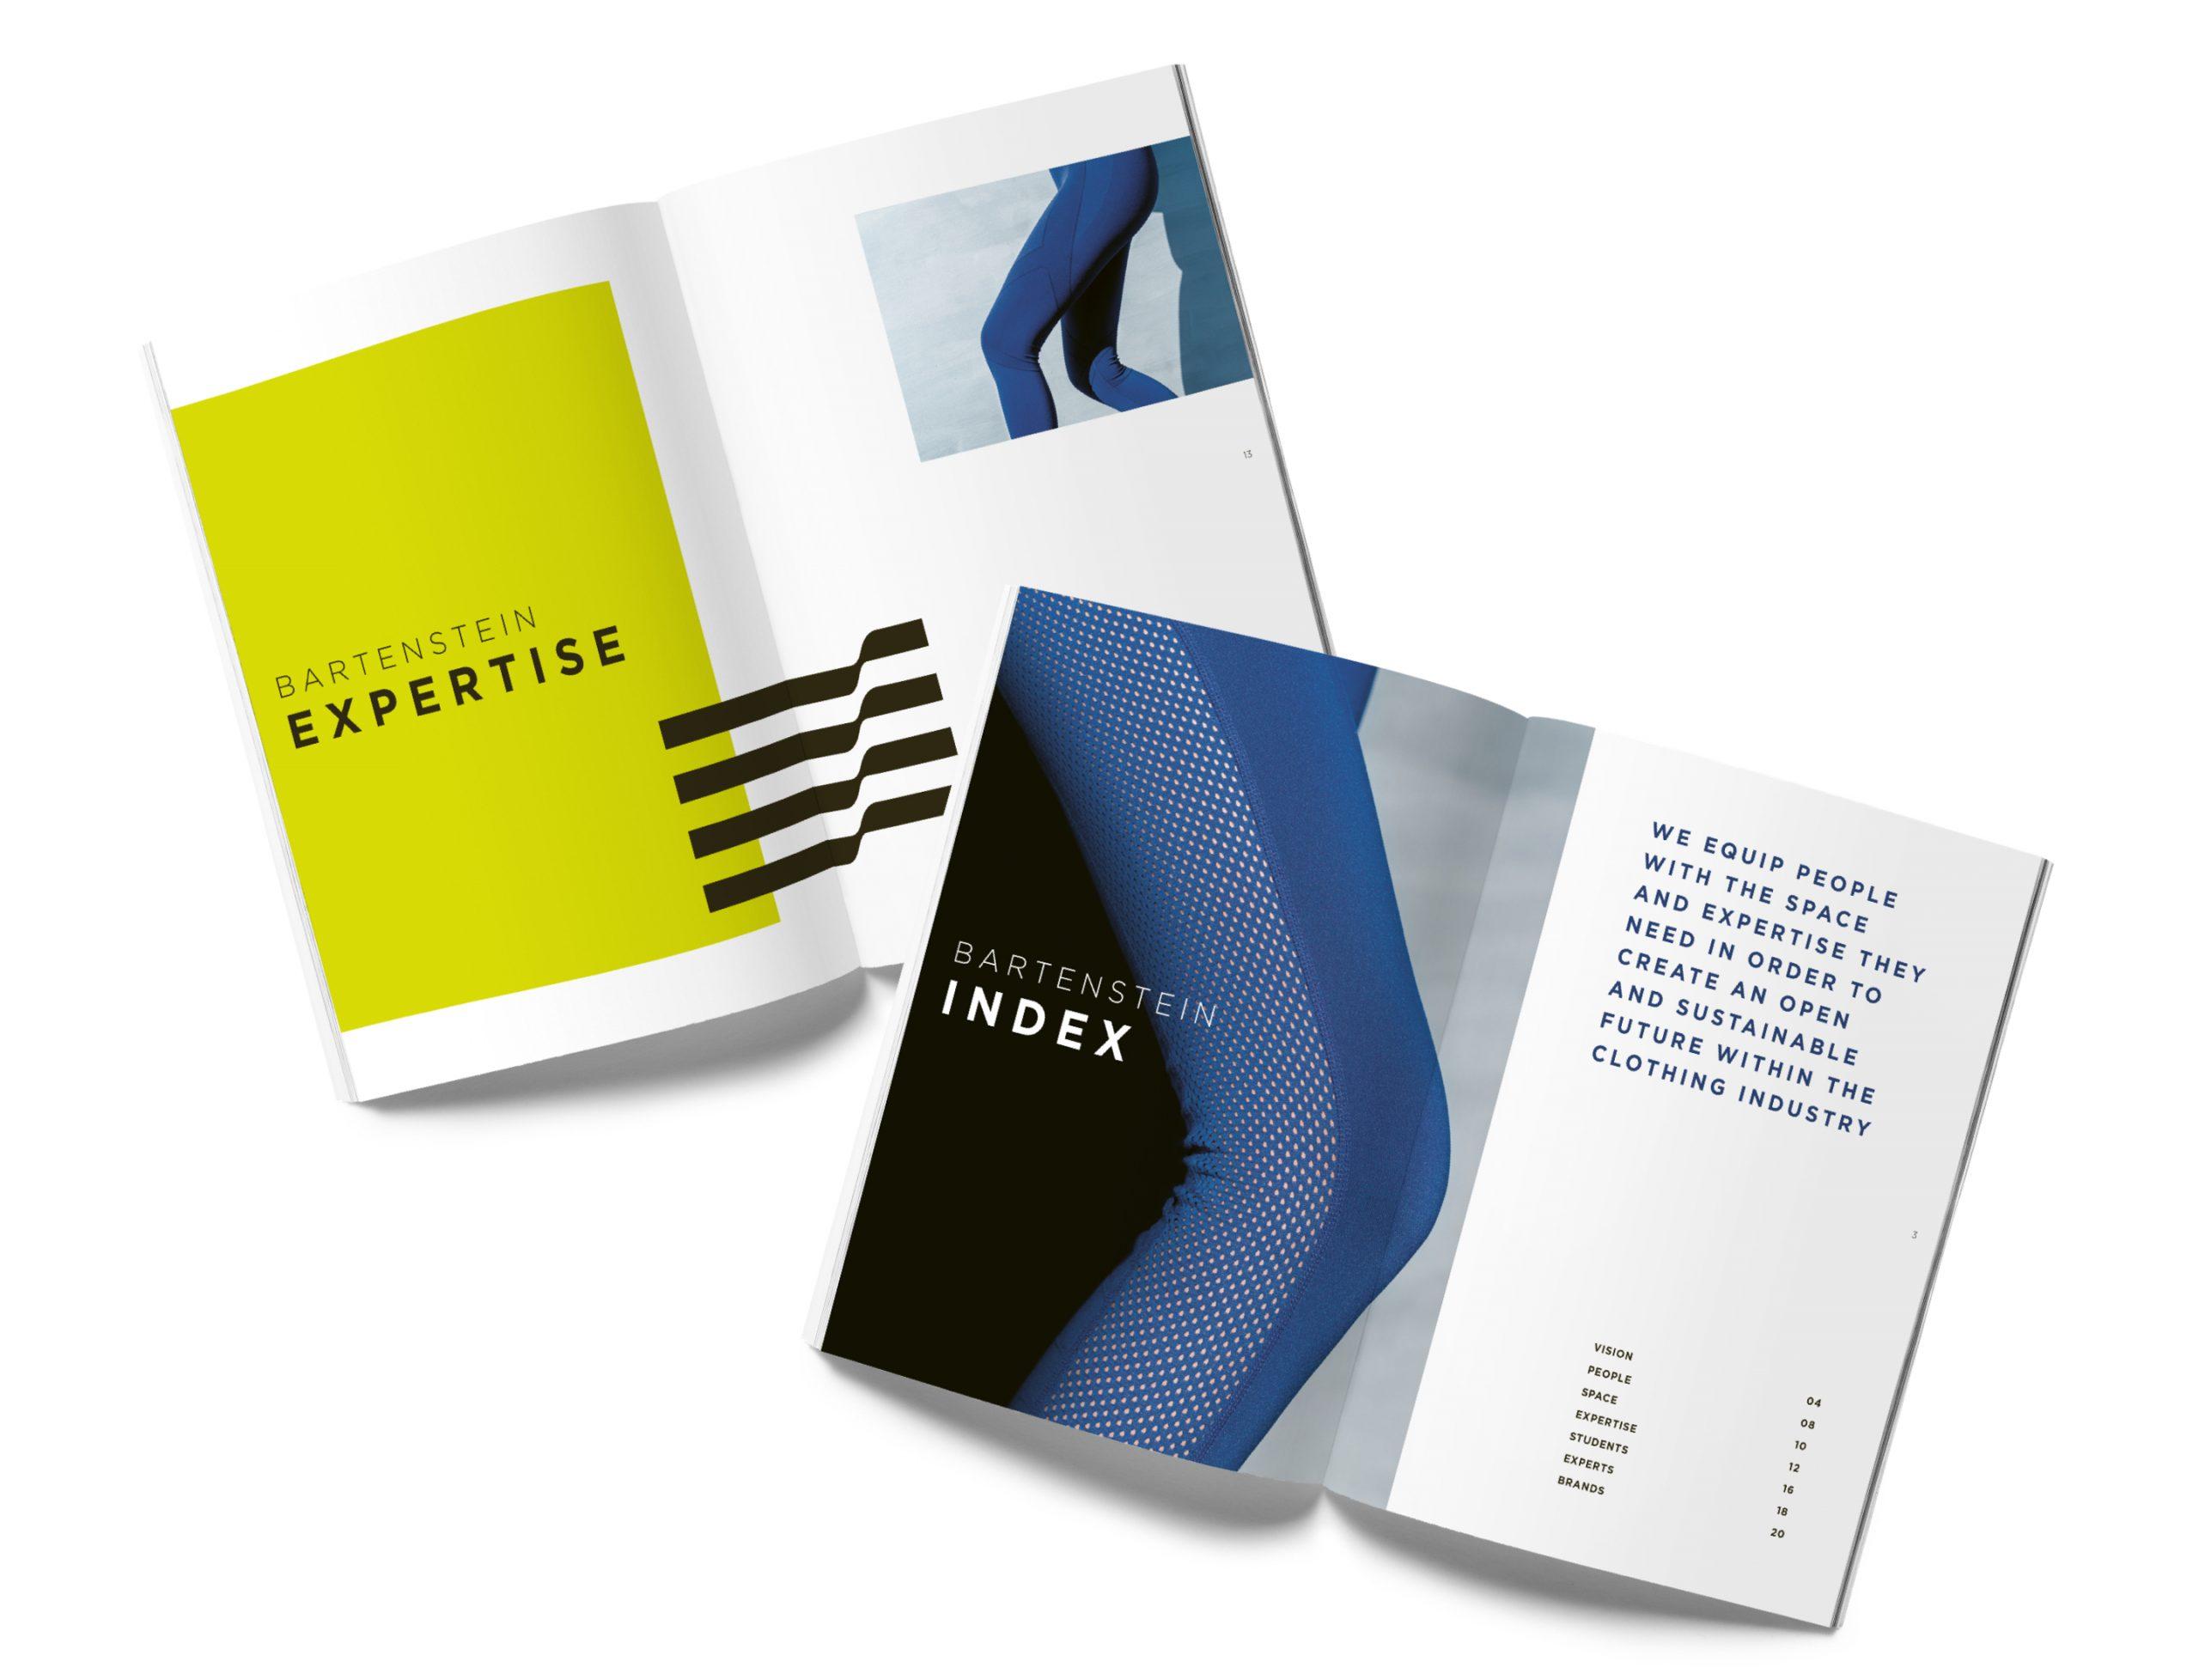 pascher-heinz-bartenstein-relaunch-print-01